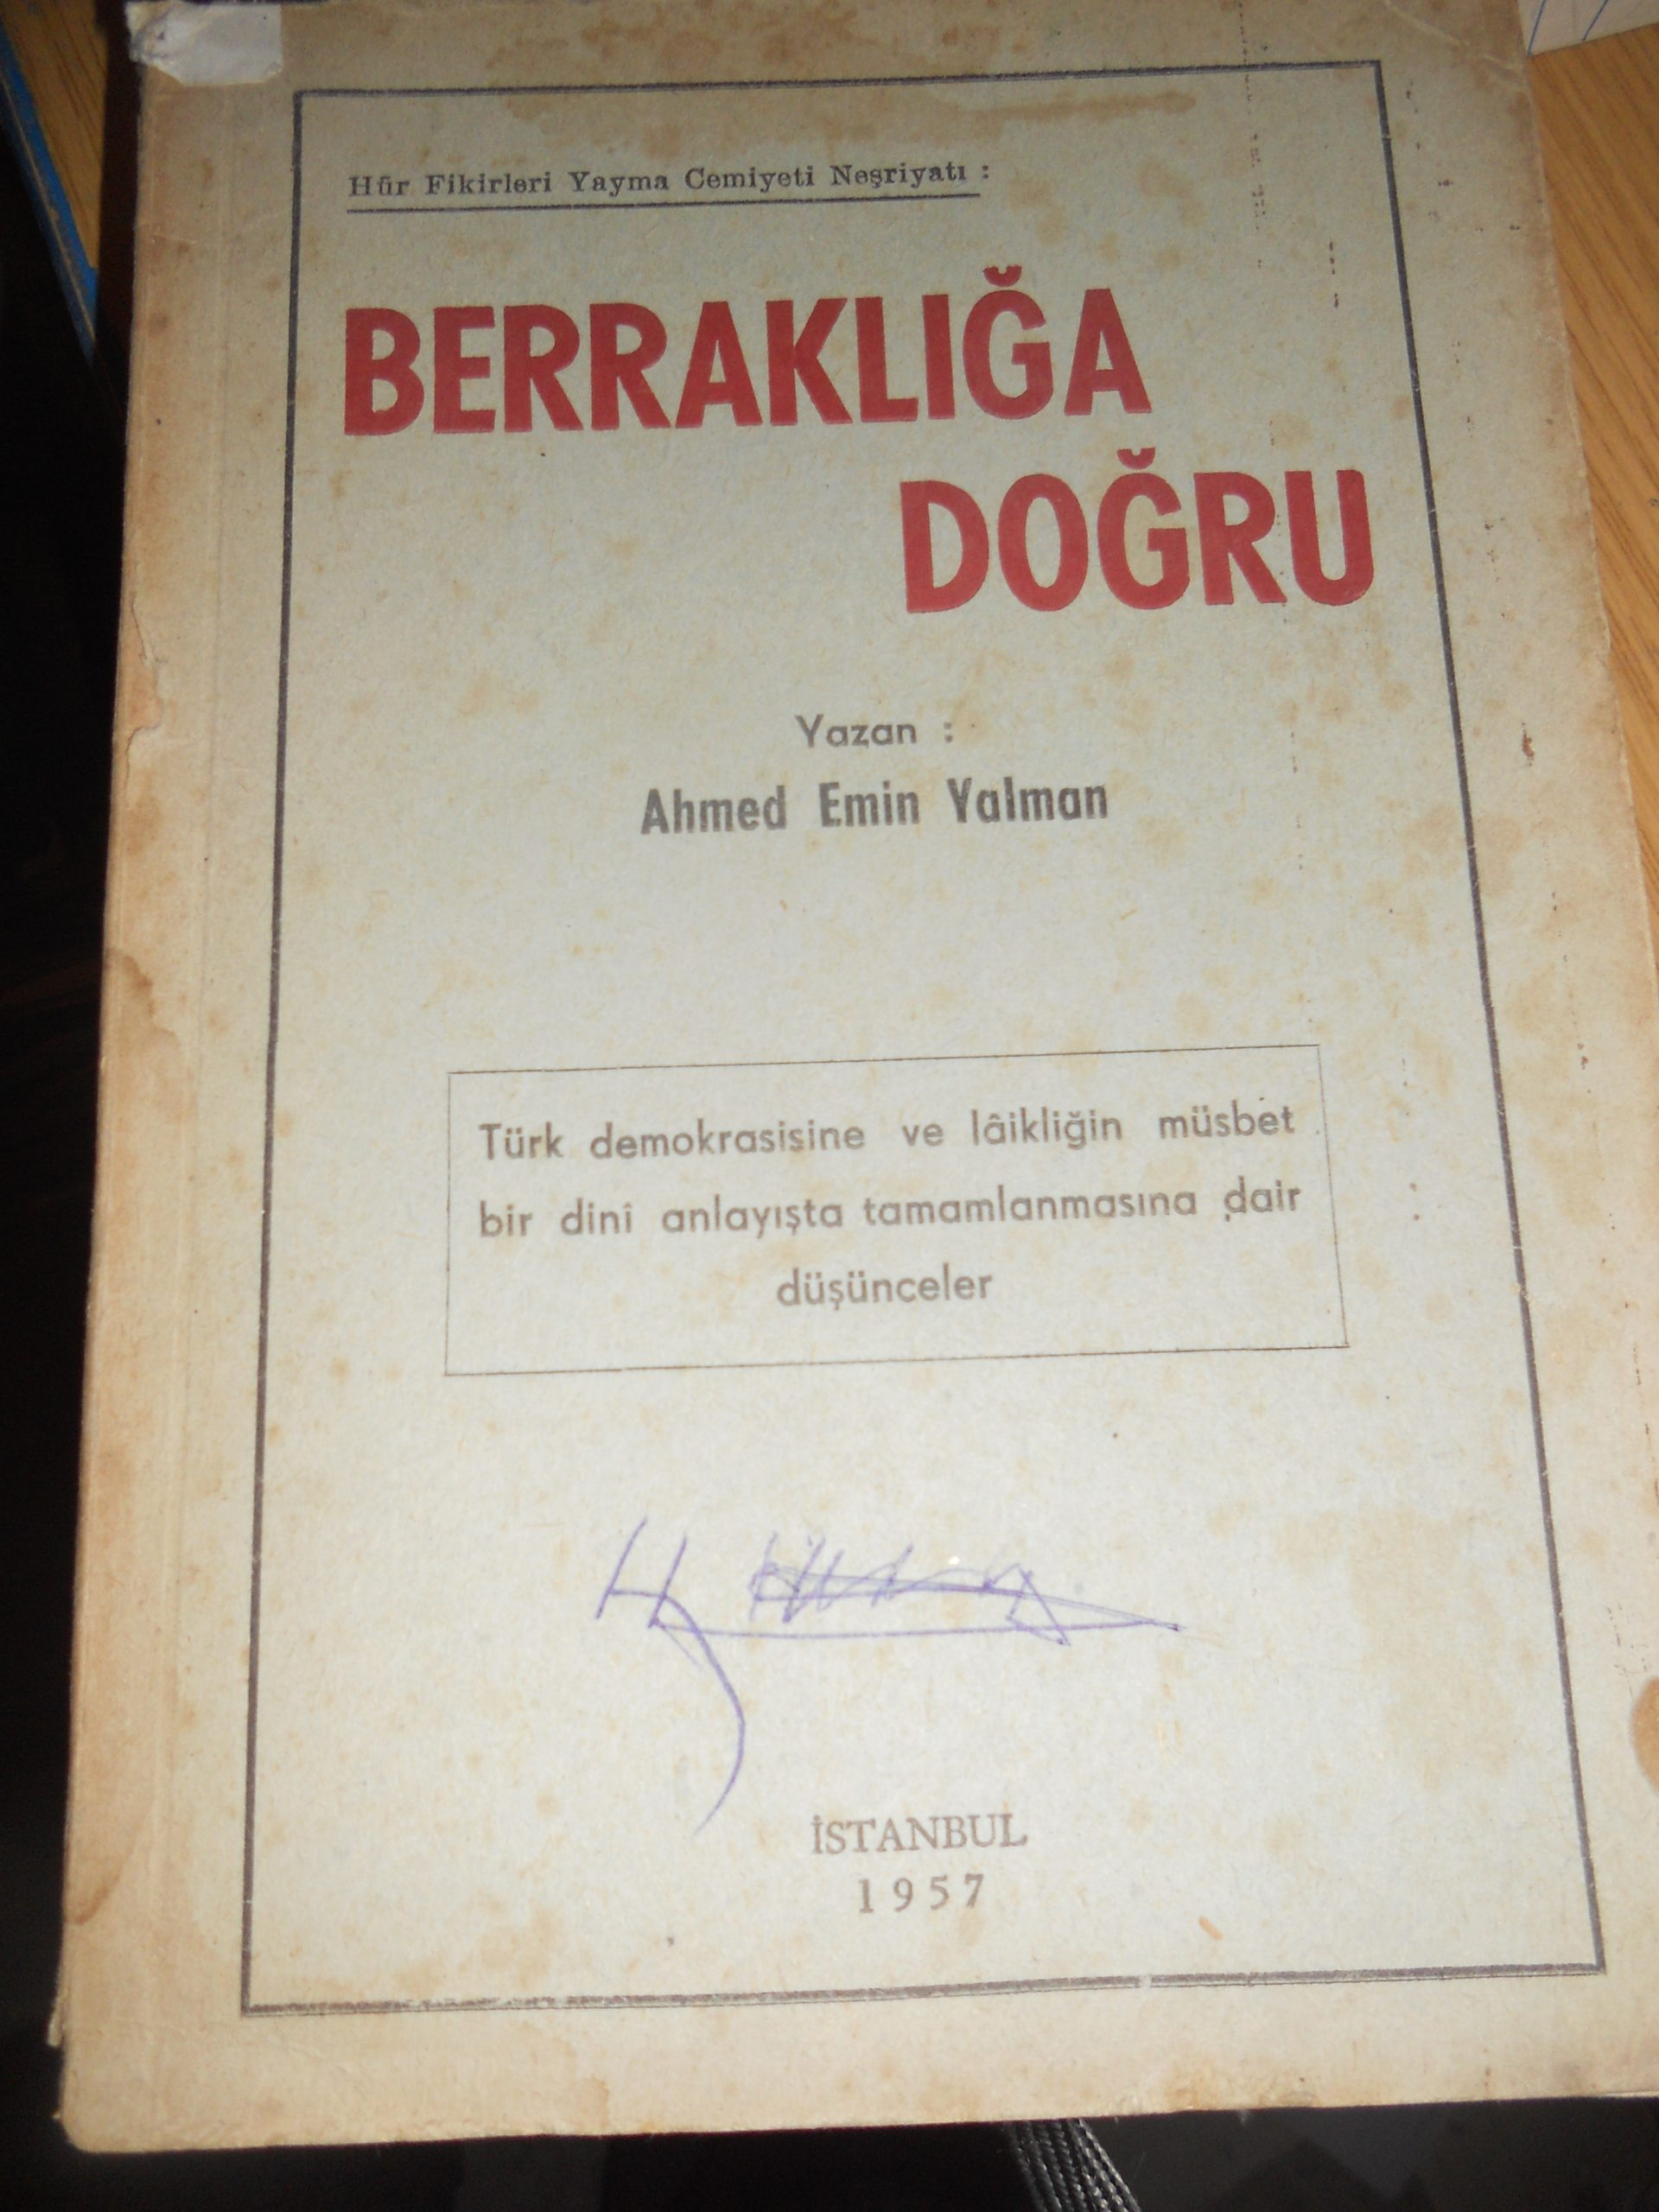 BERRAKLIĞA DOĞRU/Ahmet Emin YALMAN/15 tl